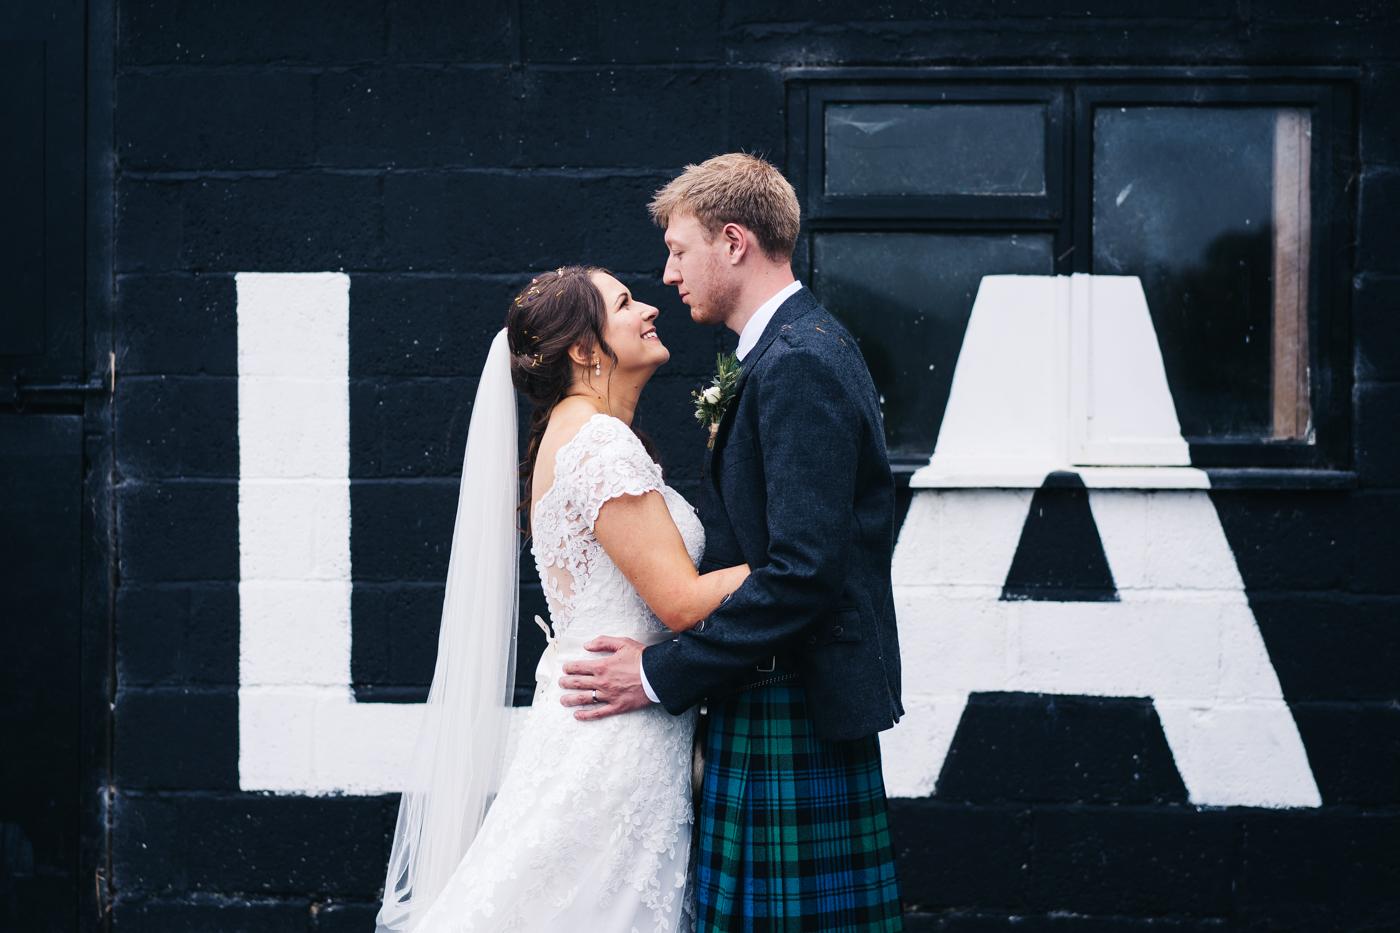 scottish-wedding-trossachs-loch-tay-highlannds-relaxed-photography-photographer-0028.jpg